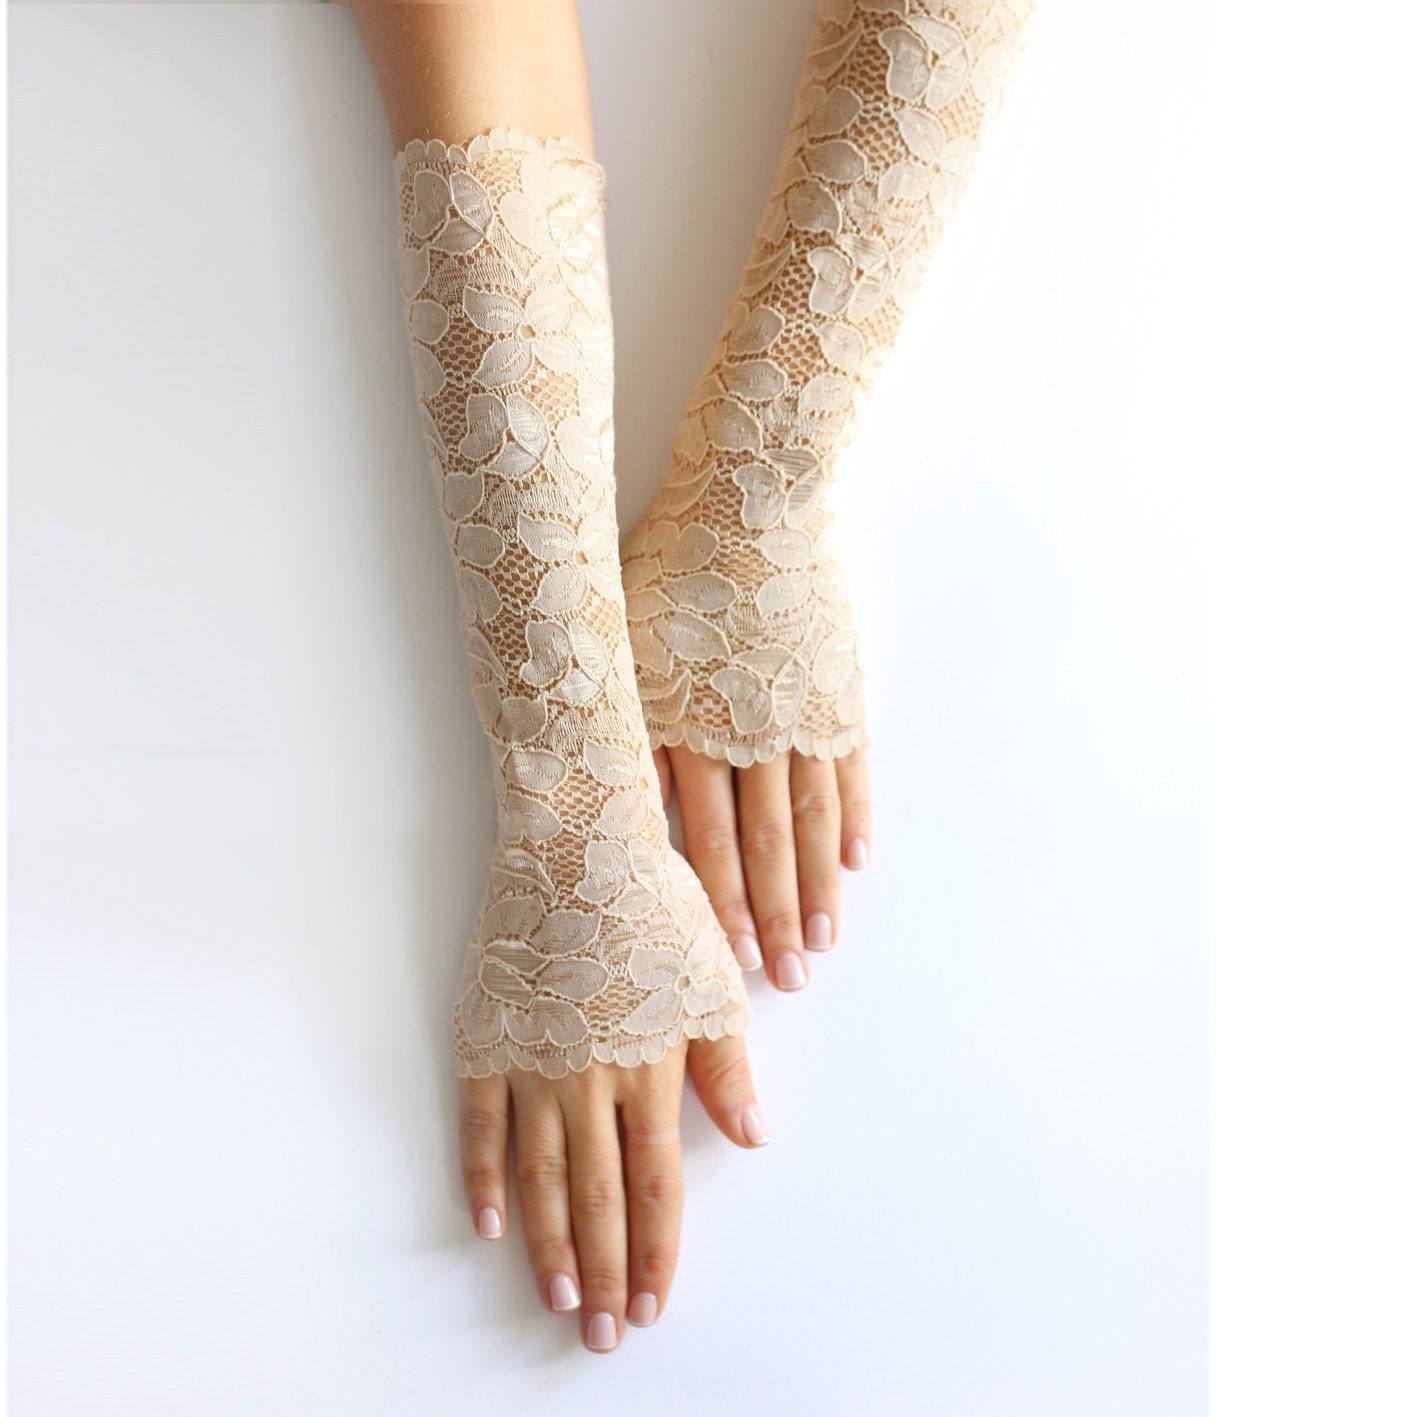 Tan lace wrist cuffs Nude bridal fingerless gloves Elastic